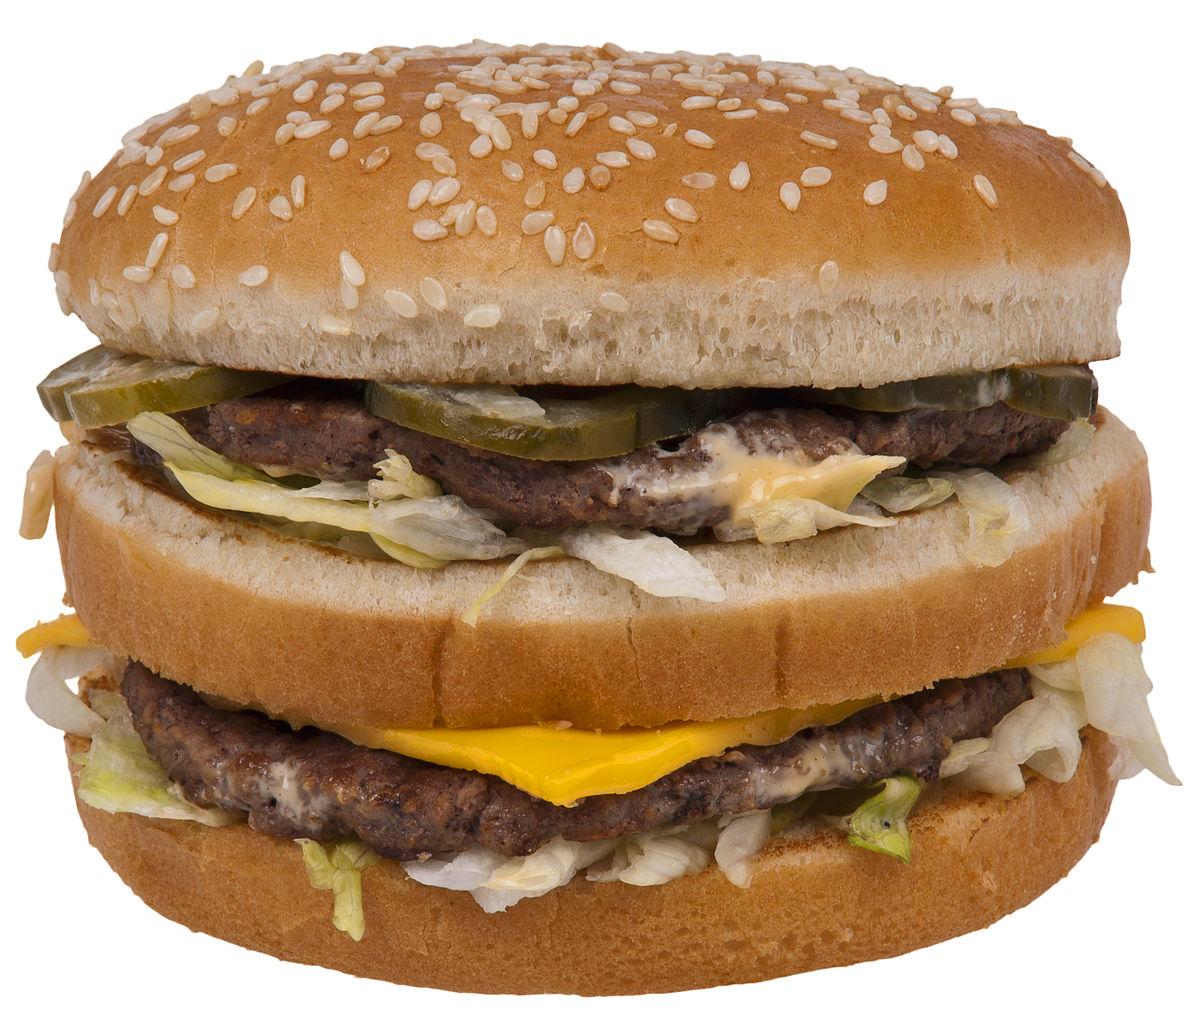 DIY 'Big Mac' for only £1.59 @ McDonalds